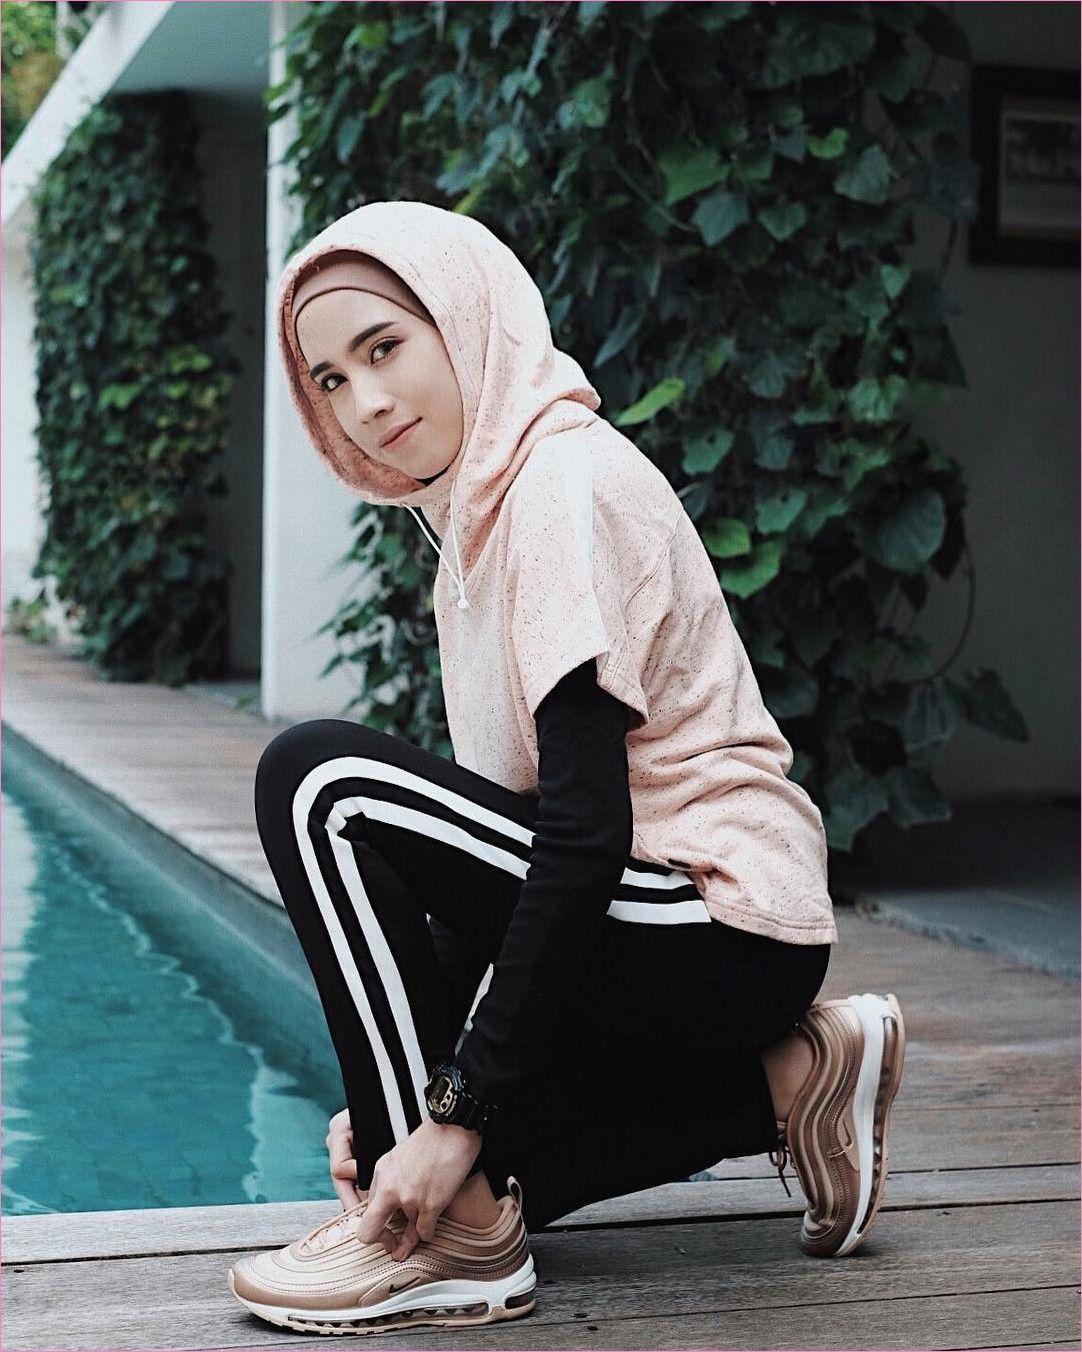 38 Trend Baju Model Hijab Casual Untuk Olahraga Gaya Selebgram Sport Outfits Hijab Casual Casual